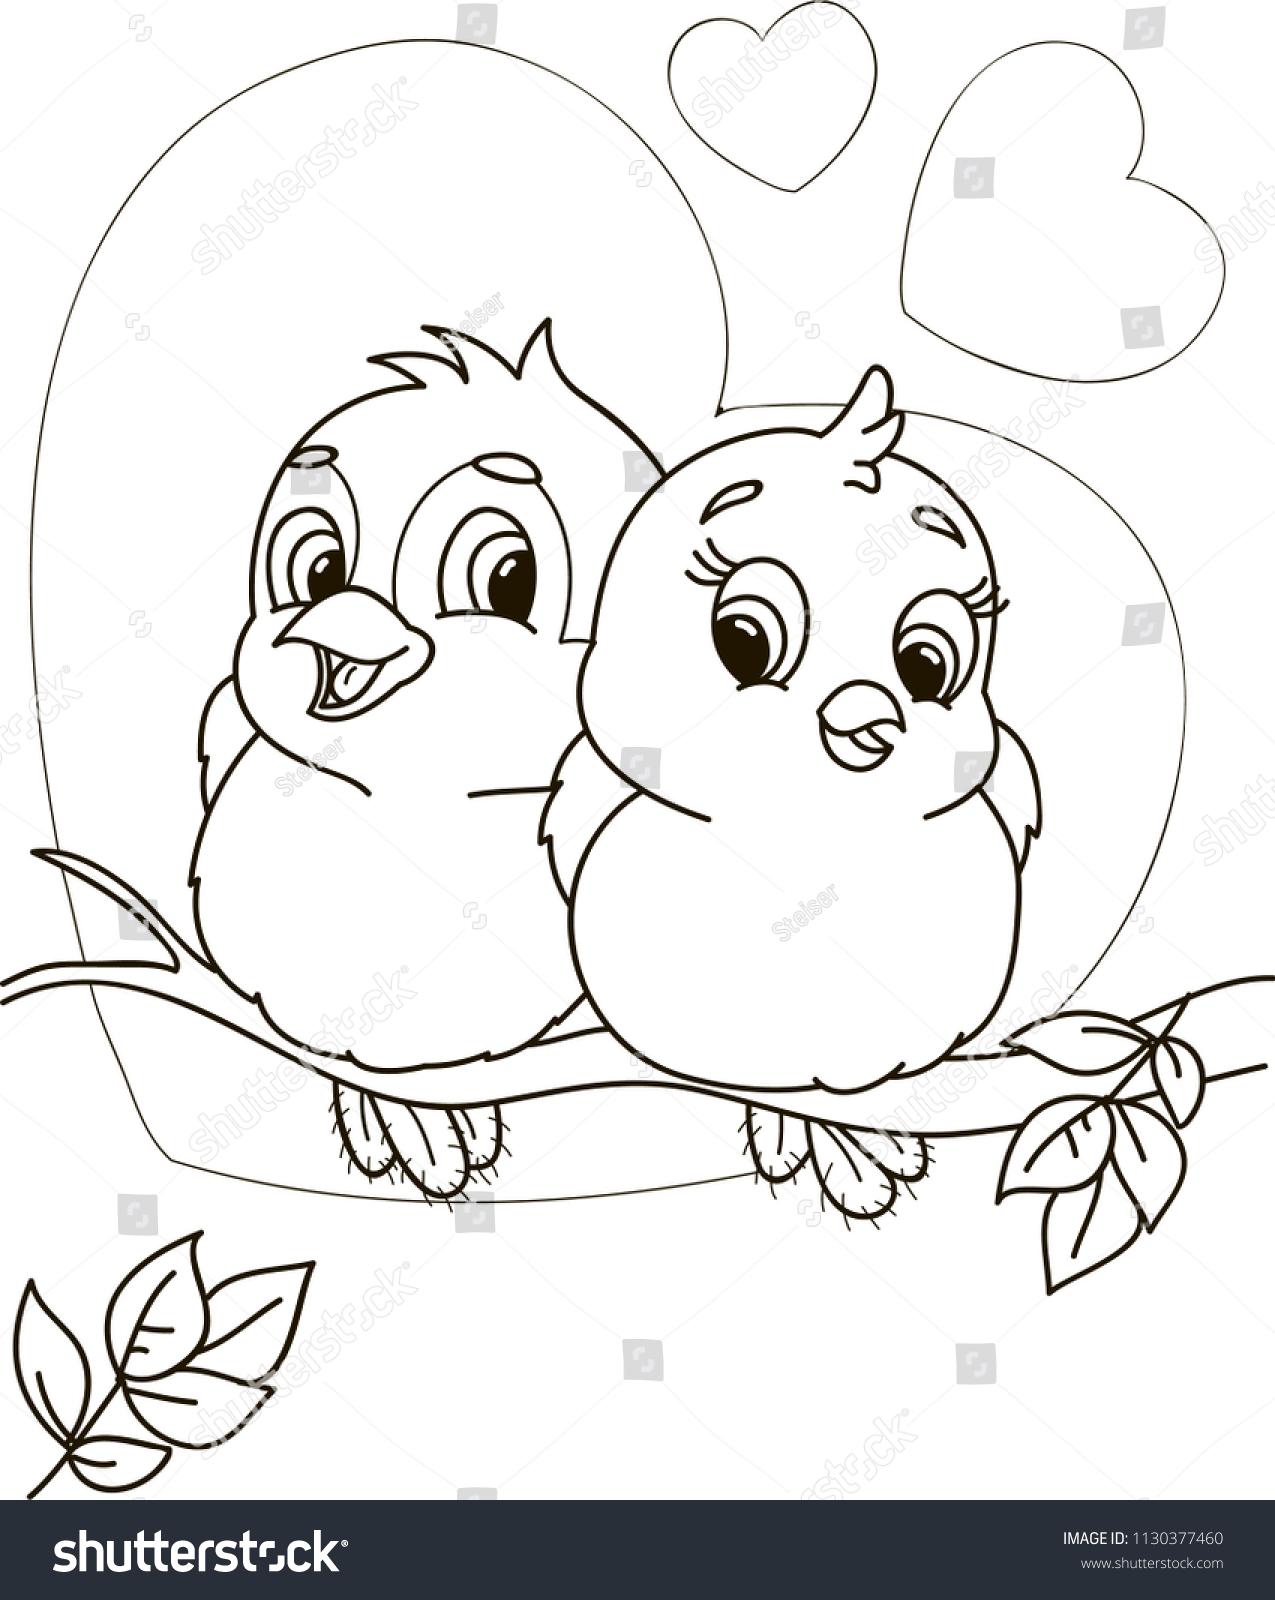 Coloring Page Outline Cartoon Cute Birds Stock Vector Royalty Free